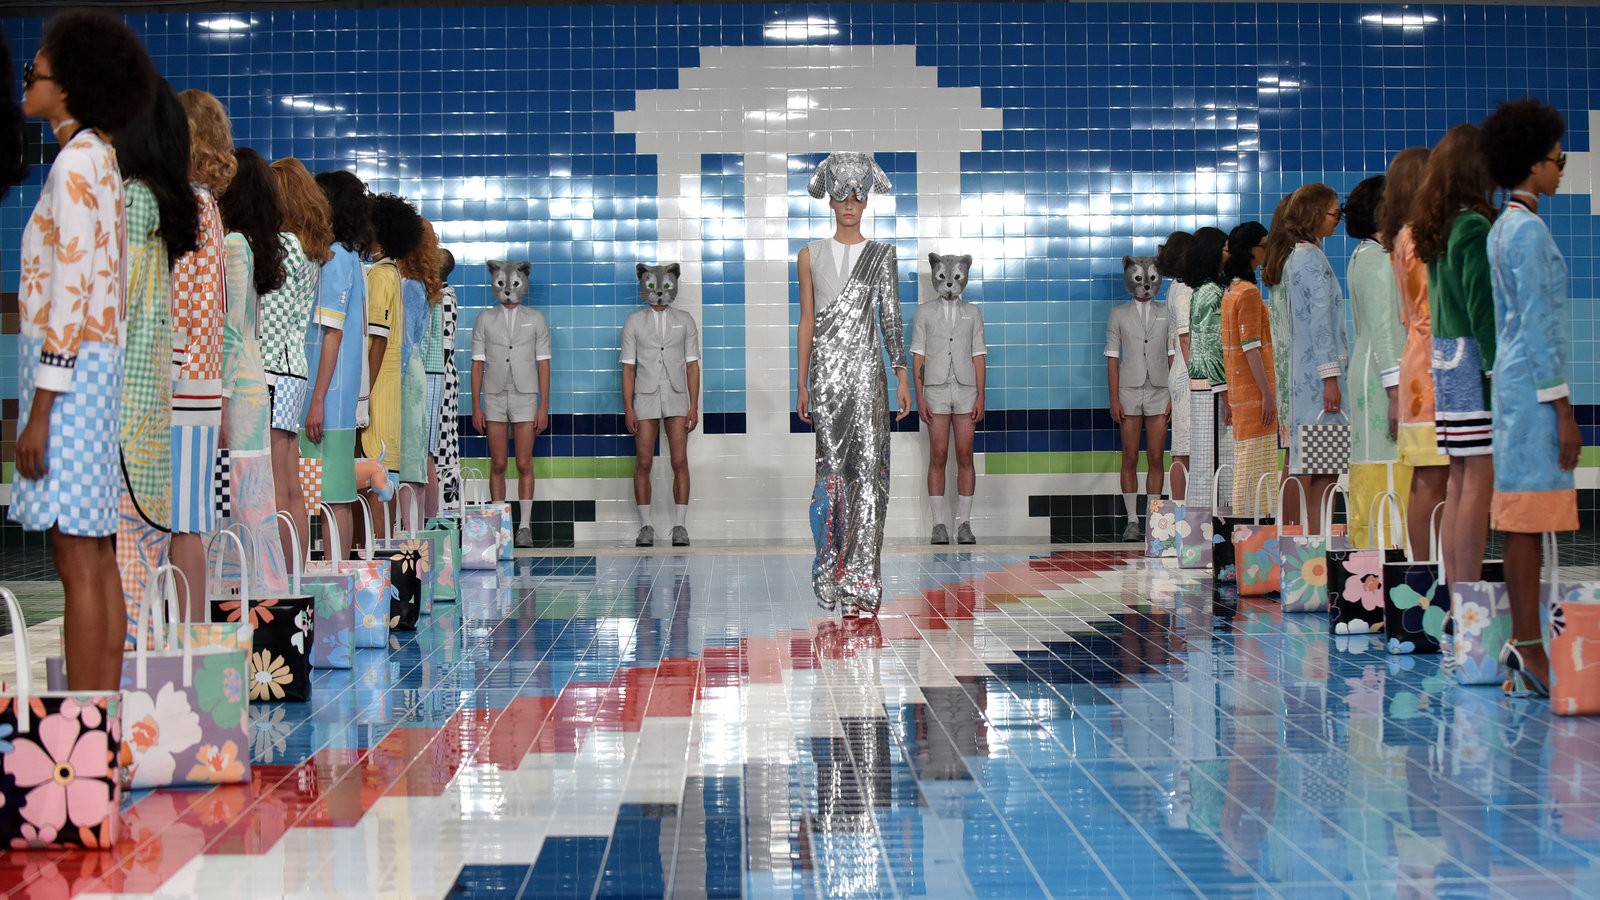 109f1aca5cf9 New York Fashion Week Comes to Life With Thom Browne and Proenza Schouler –  Sandbridge Capital